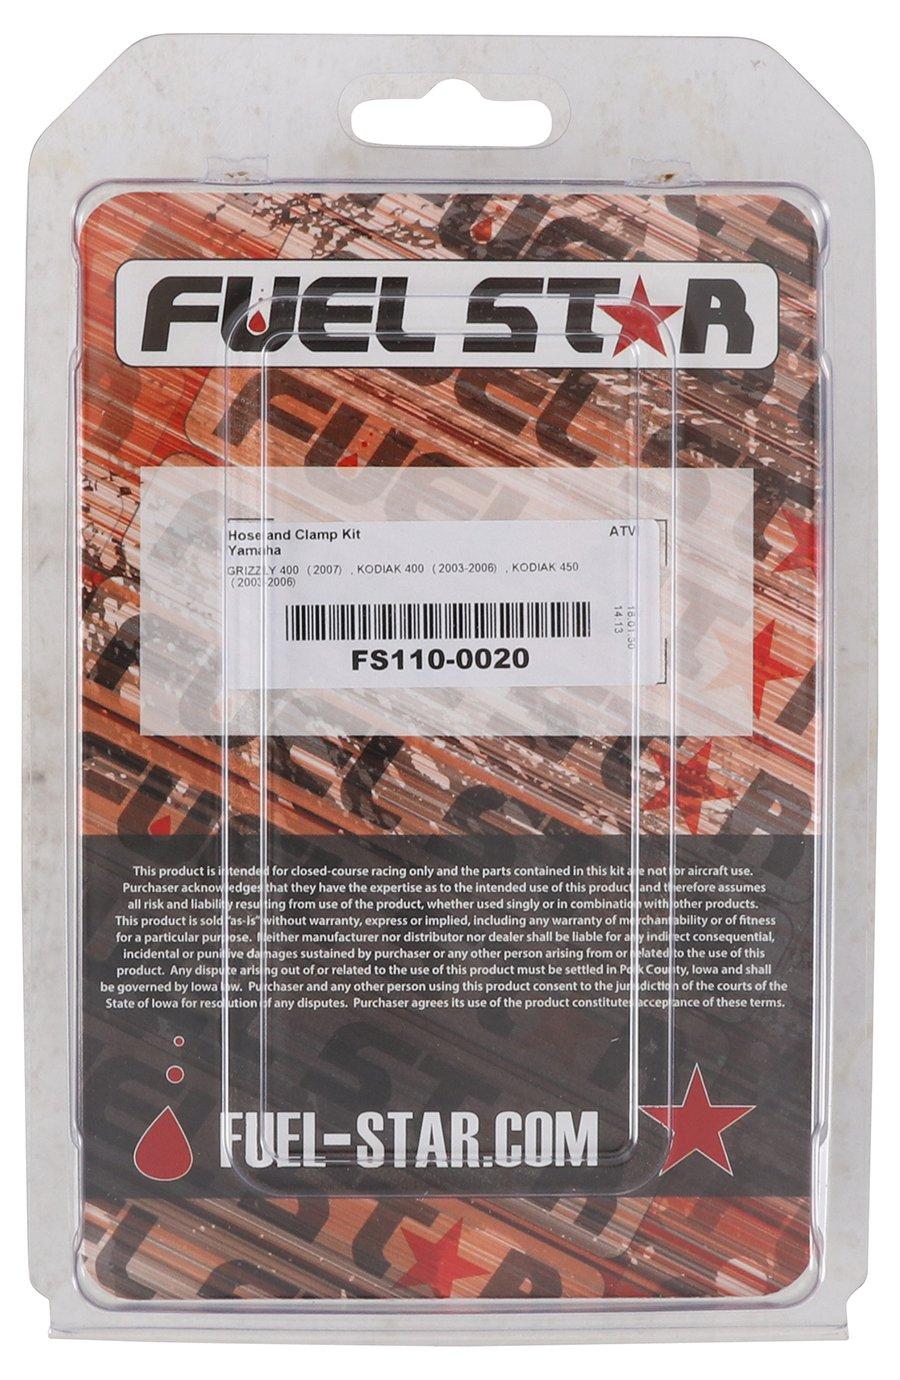 03-06 New Fuel Star Hose and Clamp Kit for Yamaha YFM 450 FA Kodiak 4x4